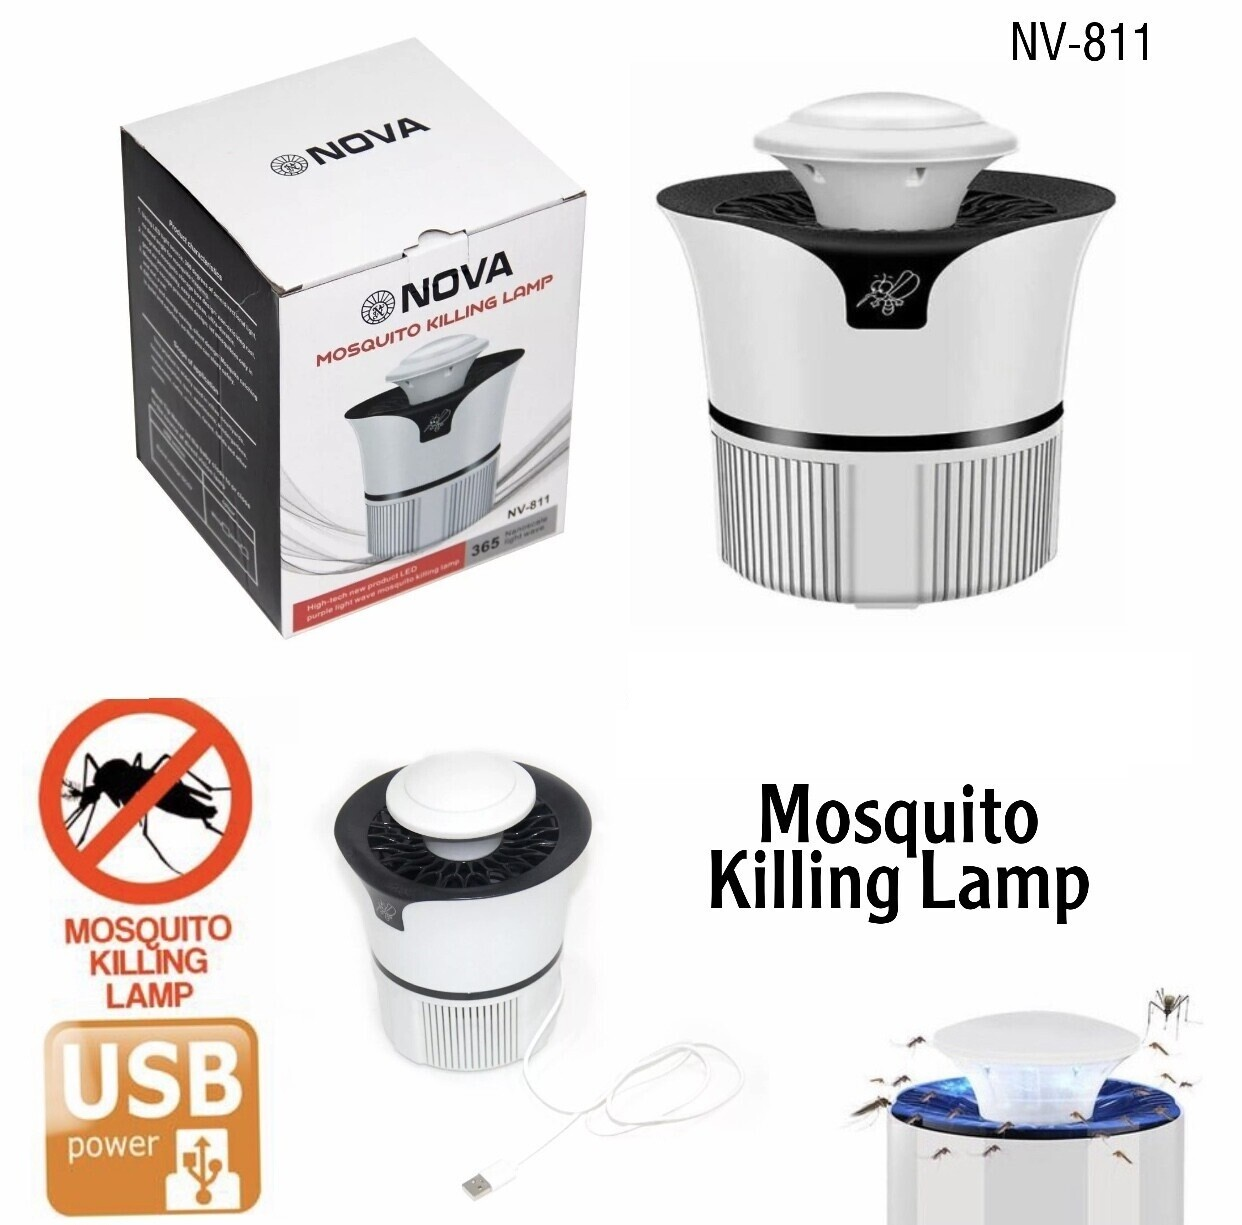 NOVA Killing Lamp NV-811